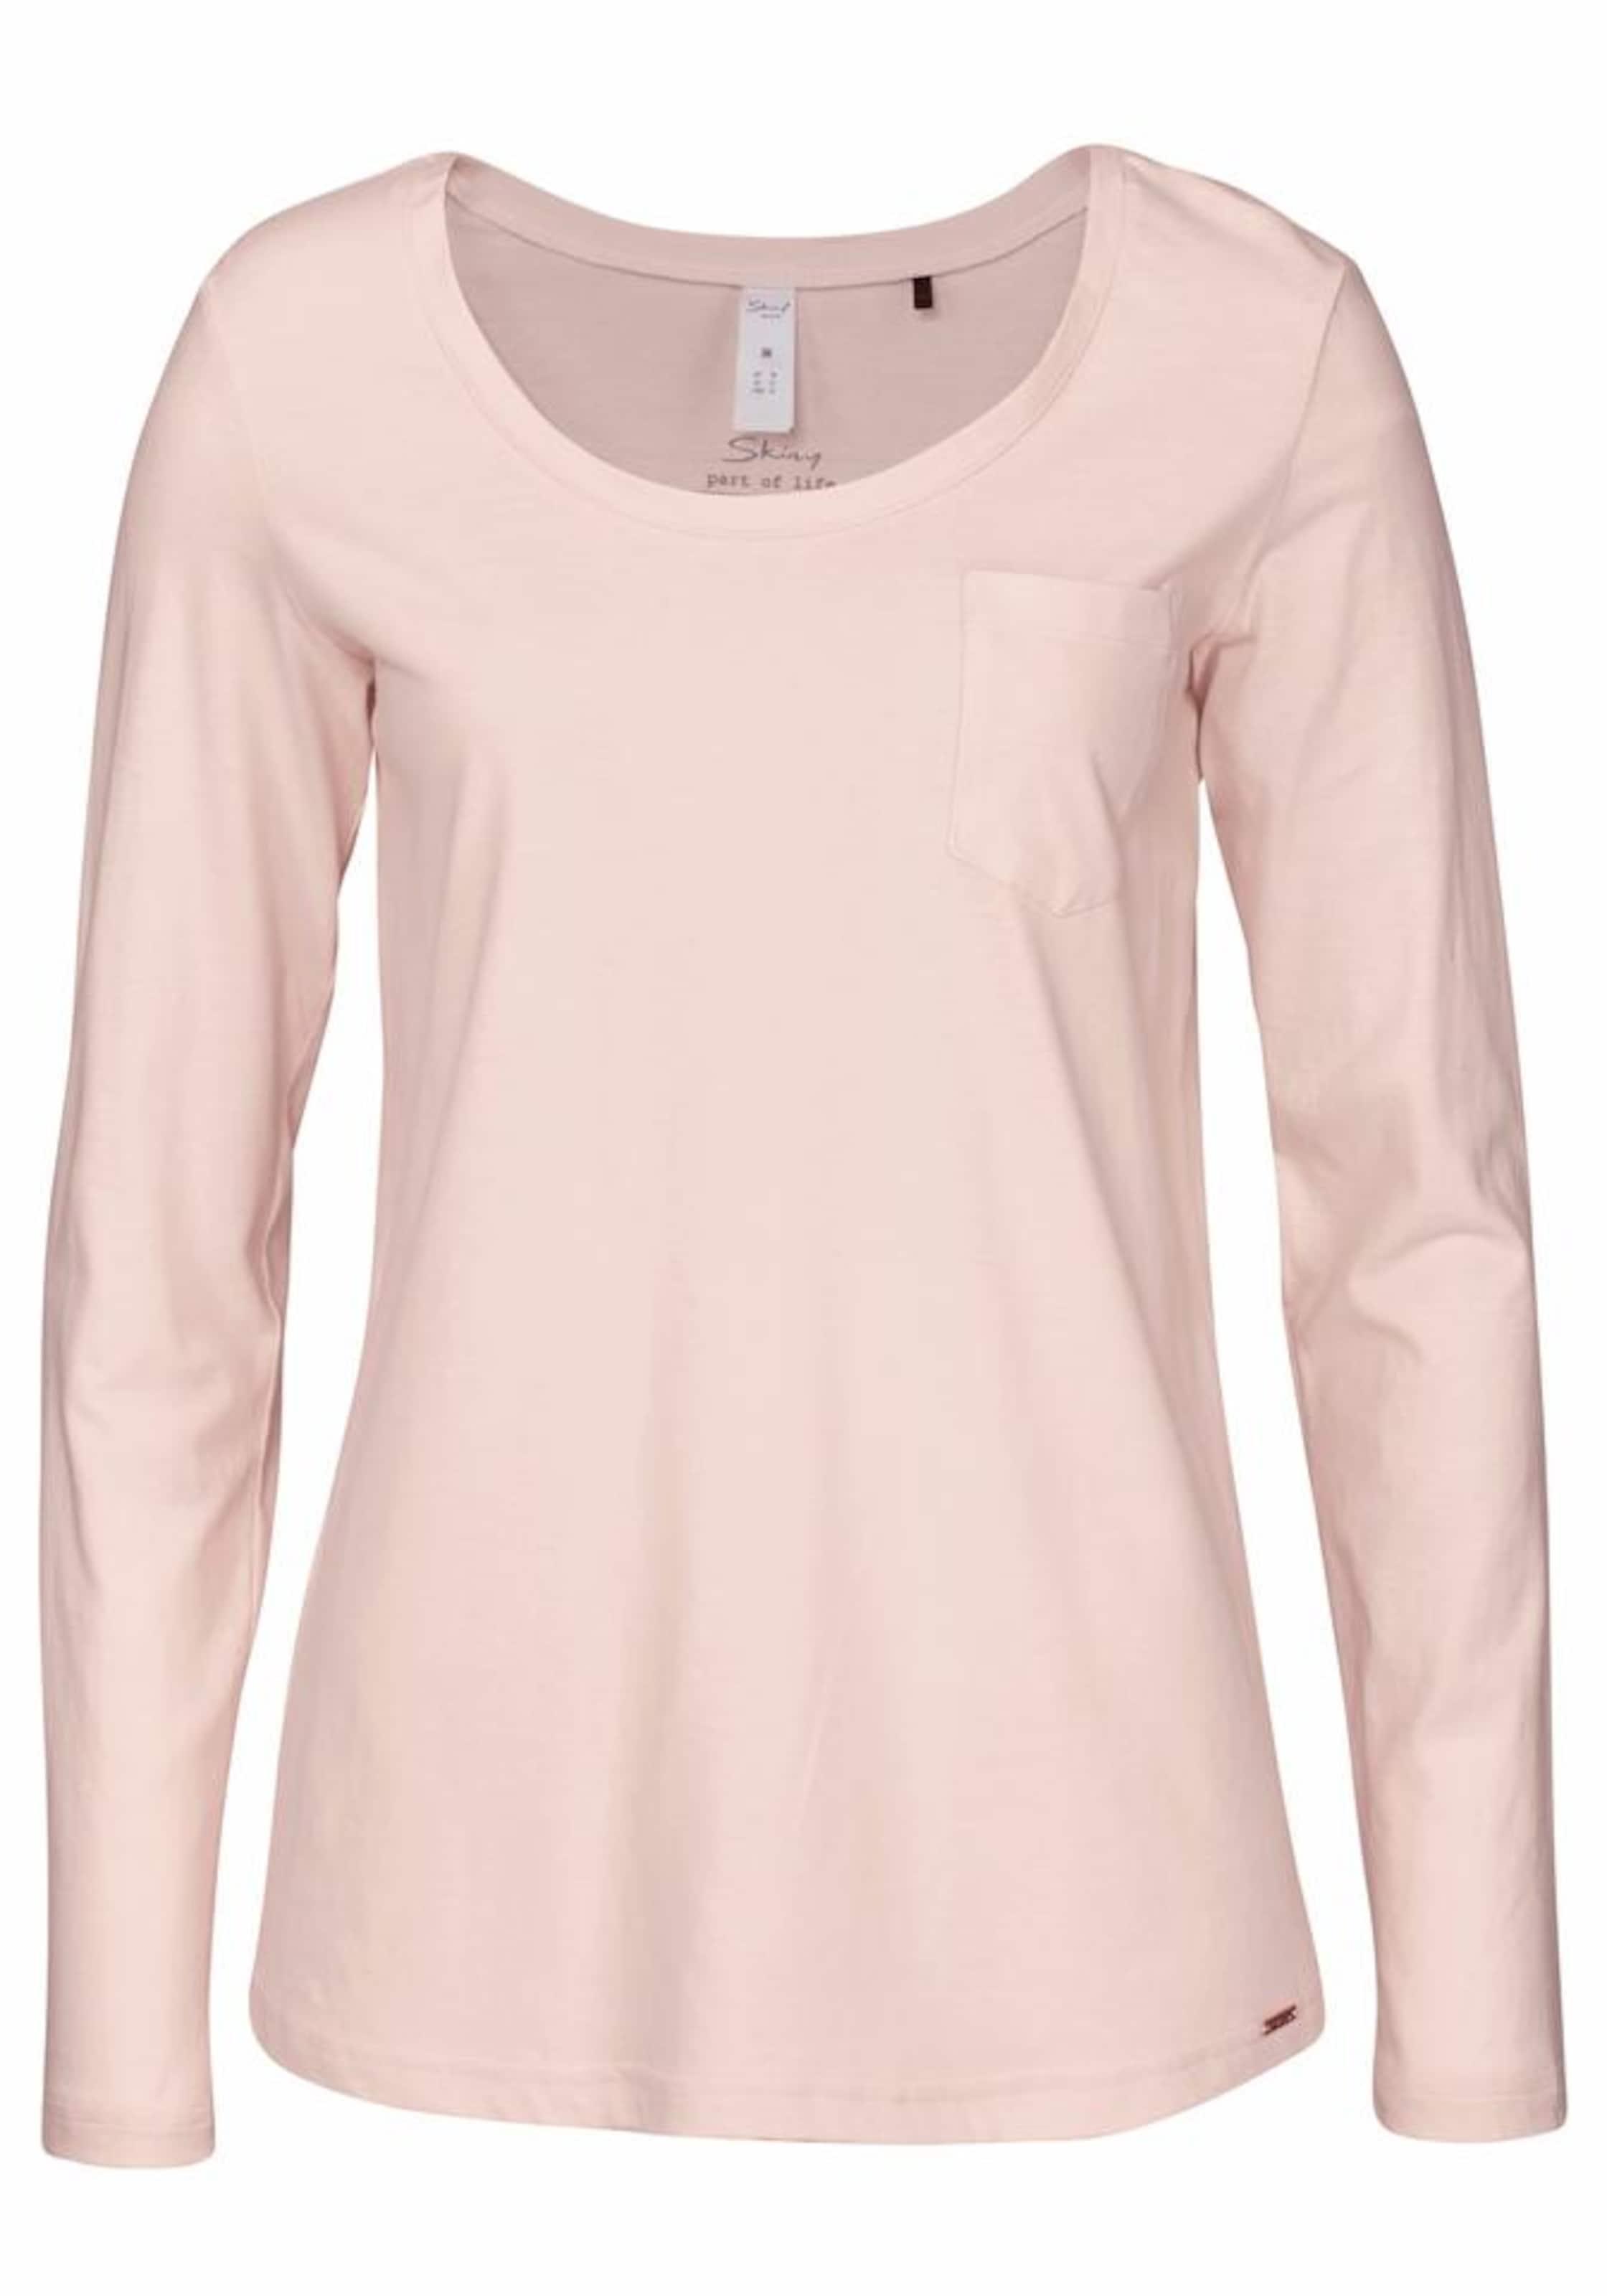 In Shirt Dream' 'sleepamp; Skiny Rosa Langarm hsQdtr